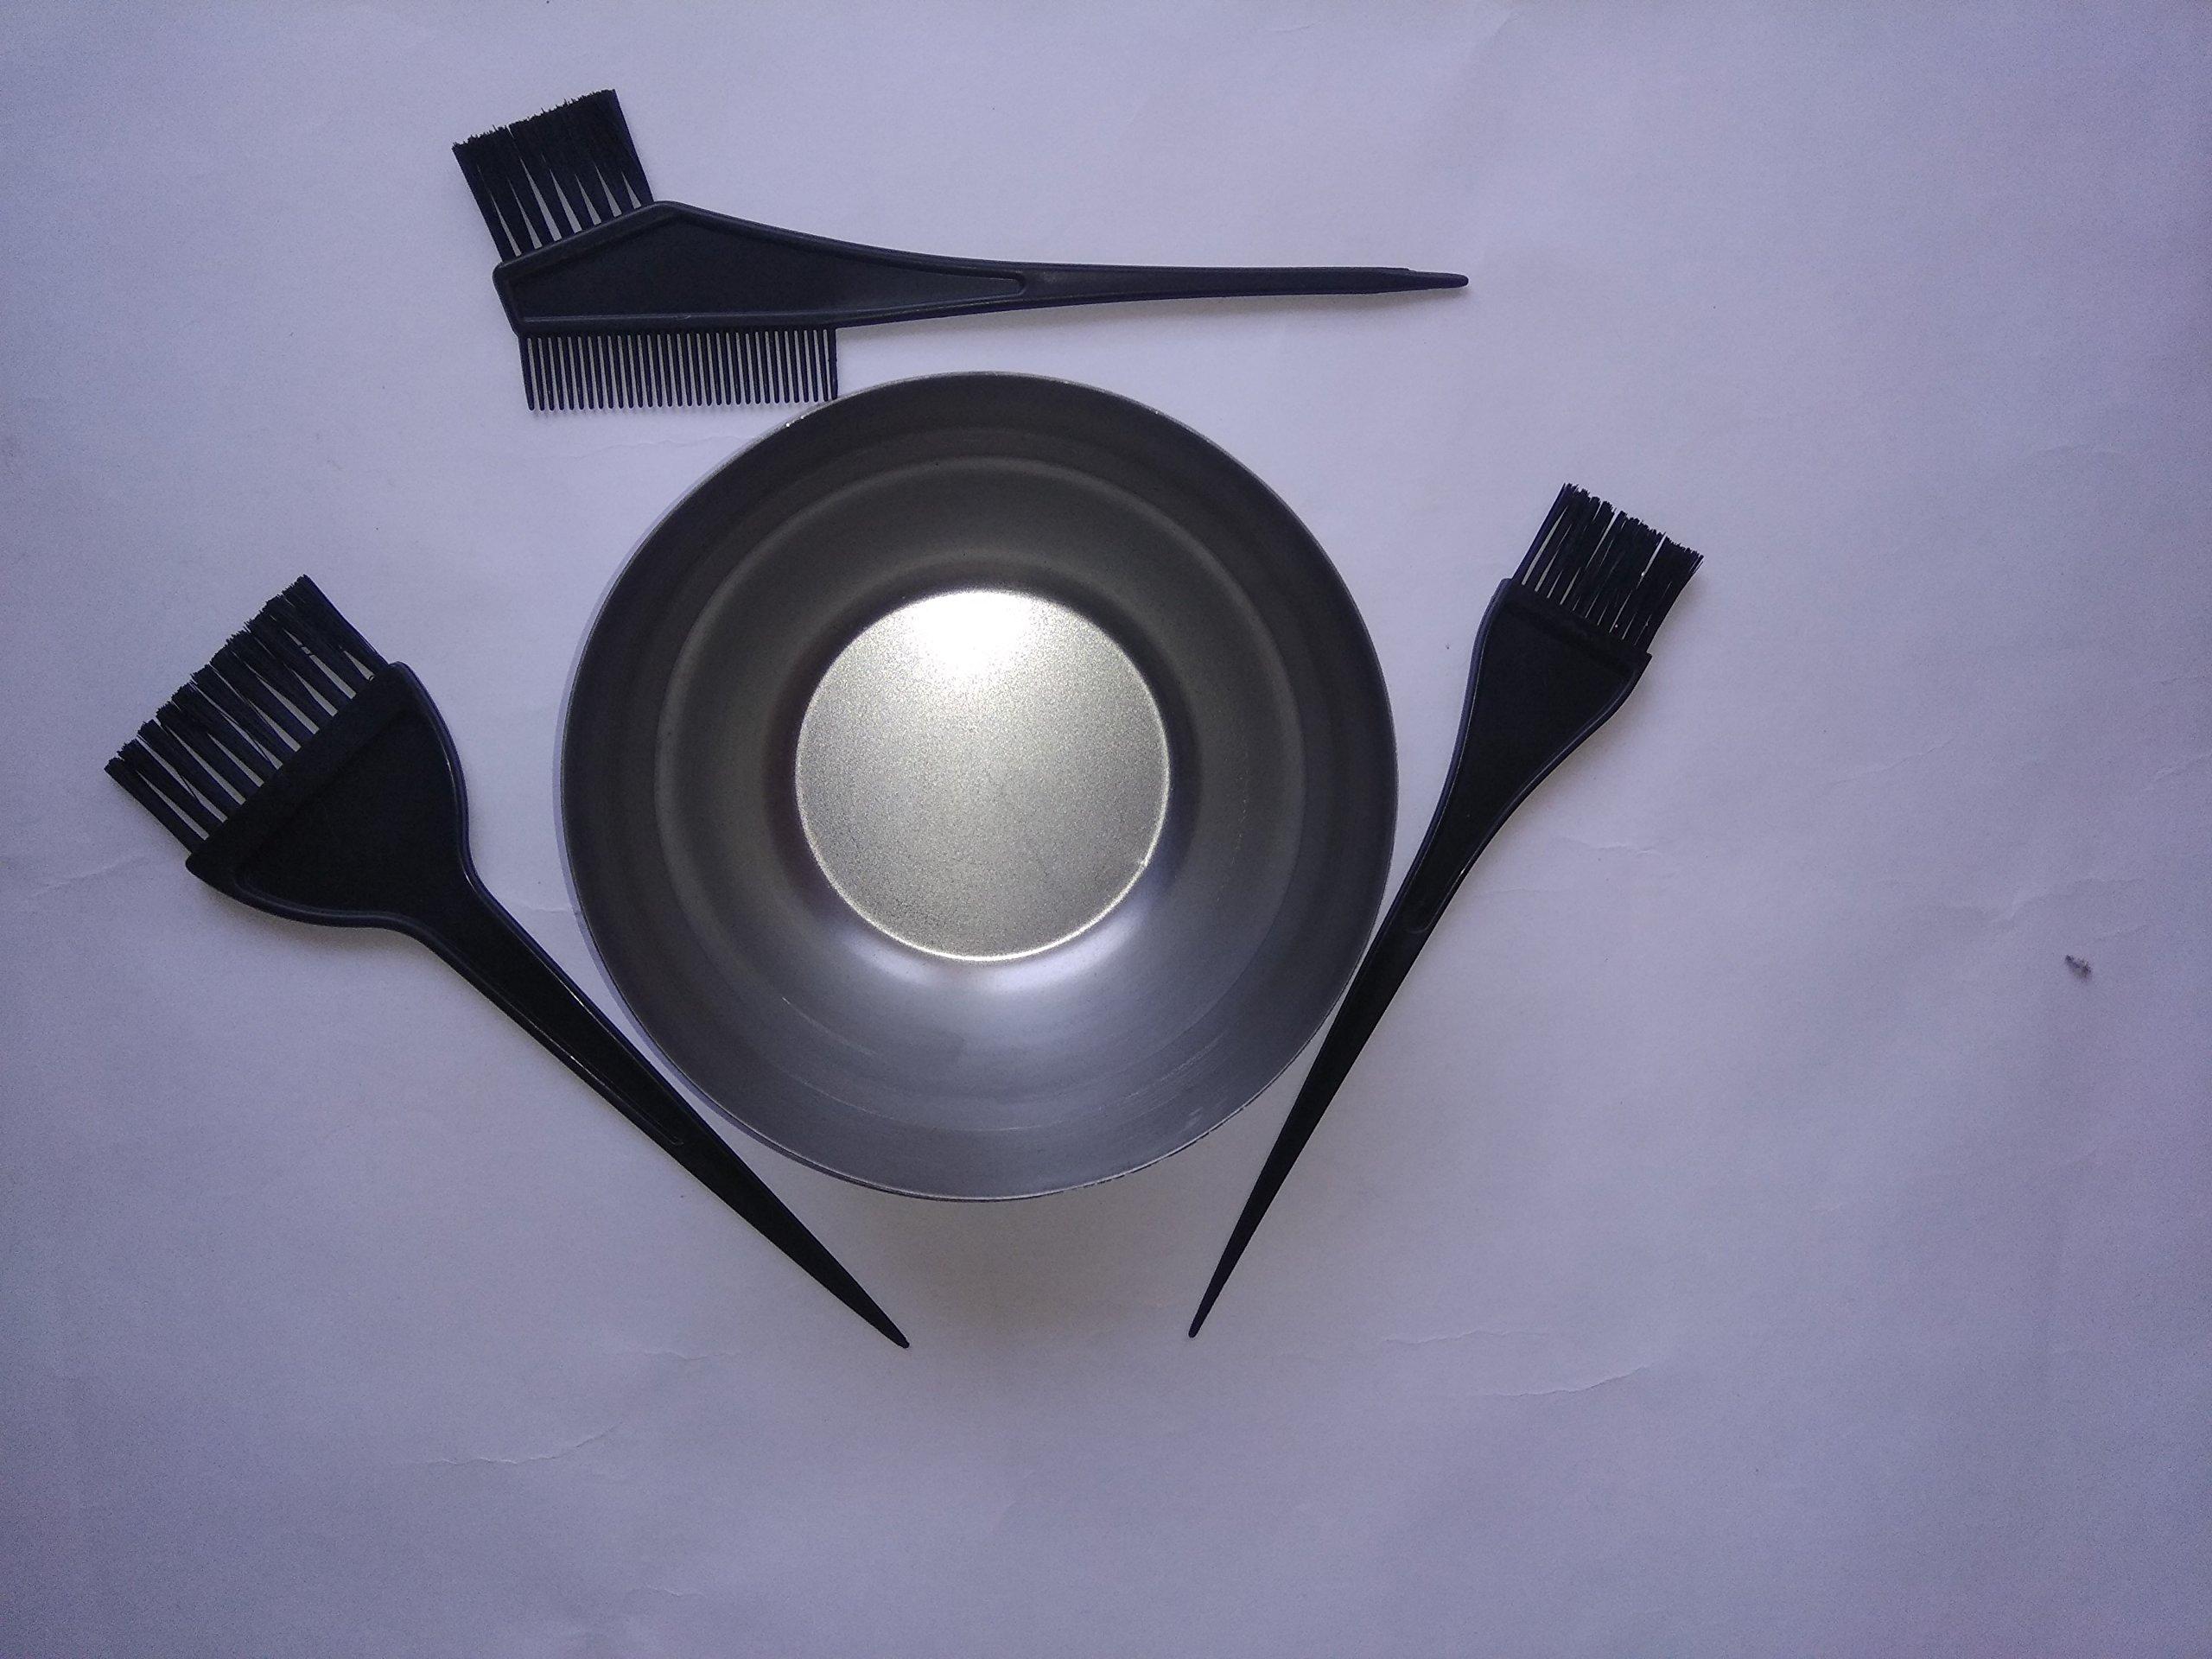 Heavy Duty Cast Iron Henna Bowl Mehendi Mixing Plate, Handmade Heena Metal Vessel for Making Natural Hair with Hair Dye Brush Set Black (3pcs Hairdressing Brushes) by Romano Rain